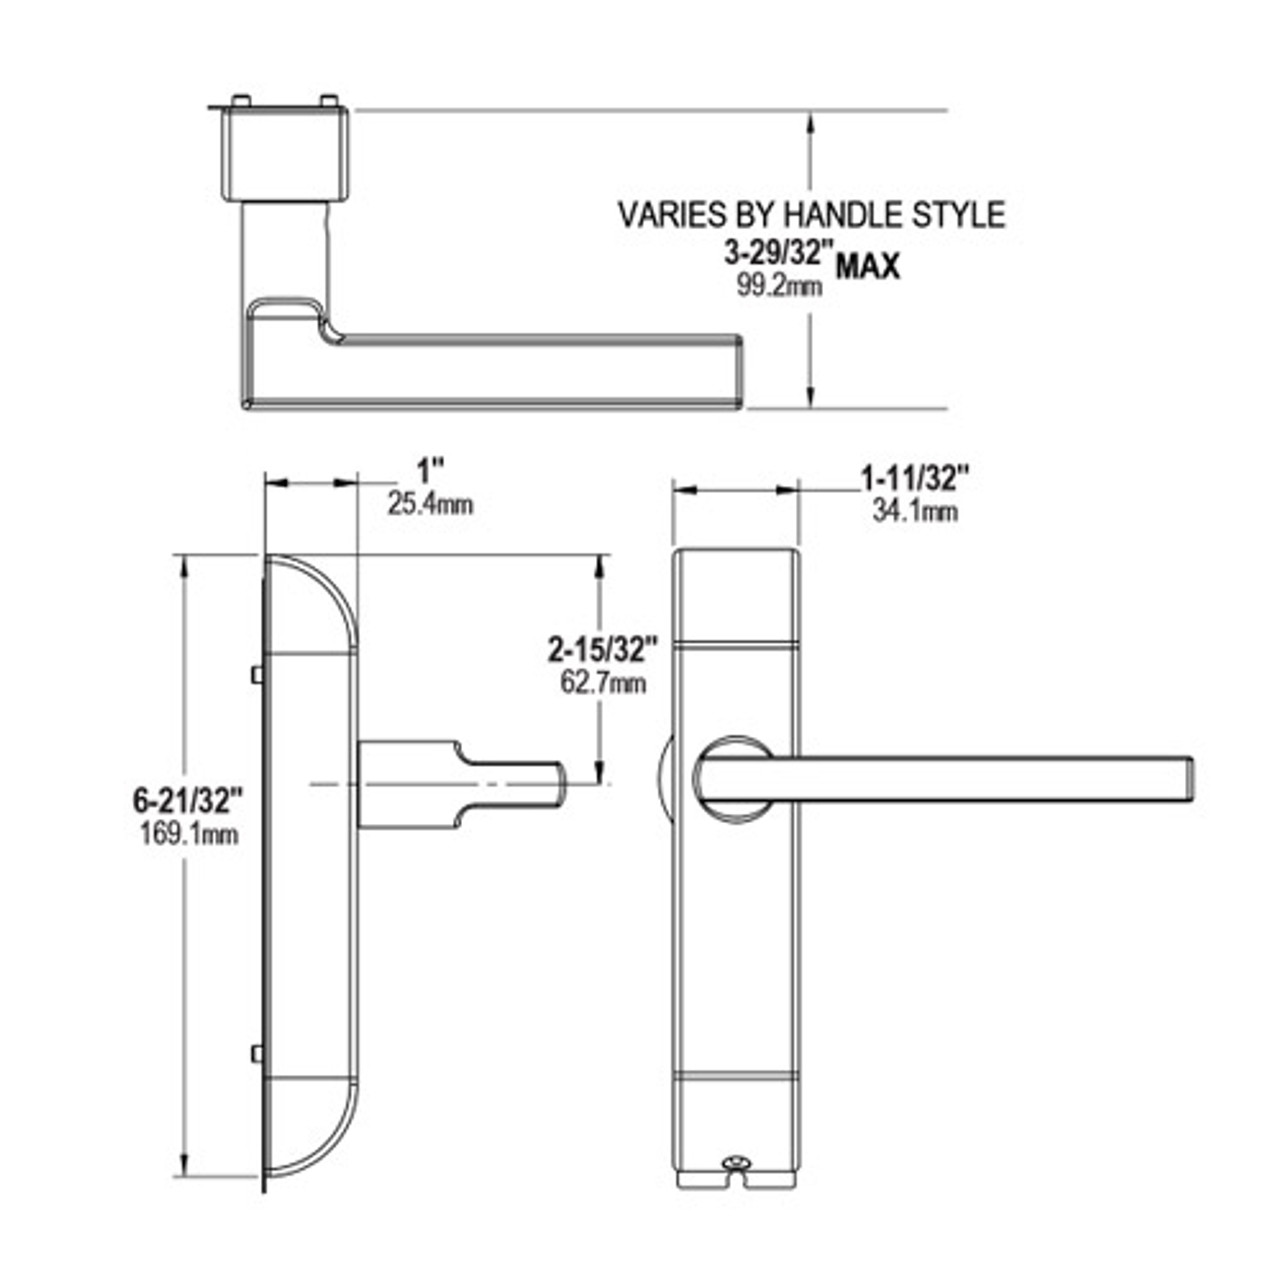 4600-MI-512-US4 Adams Rite MI Designer handle Dimensional View